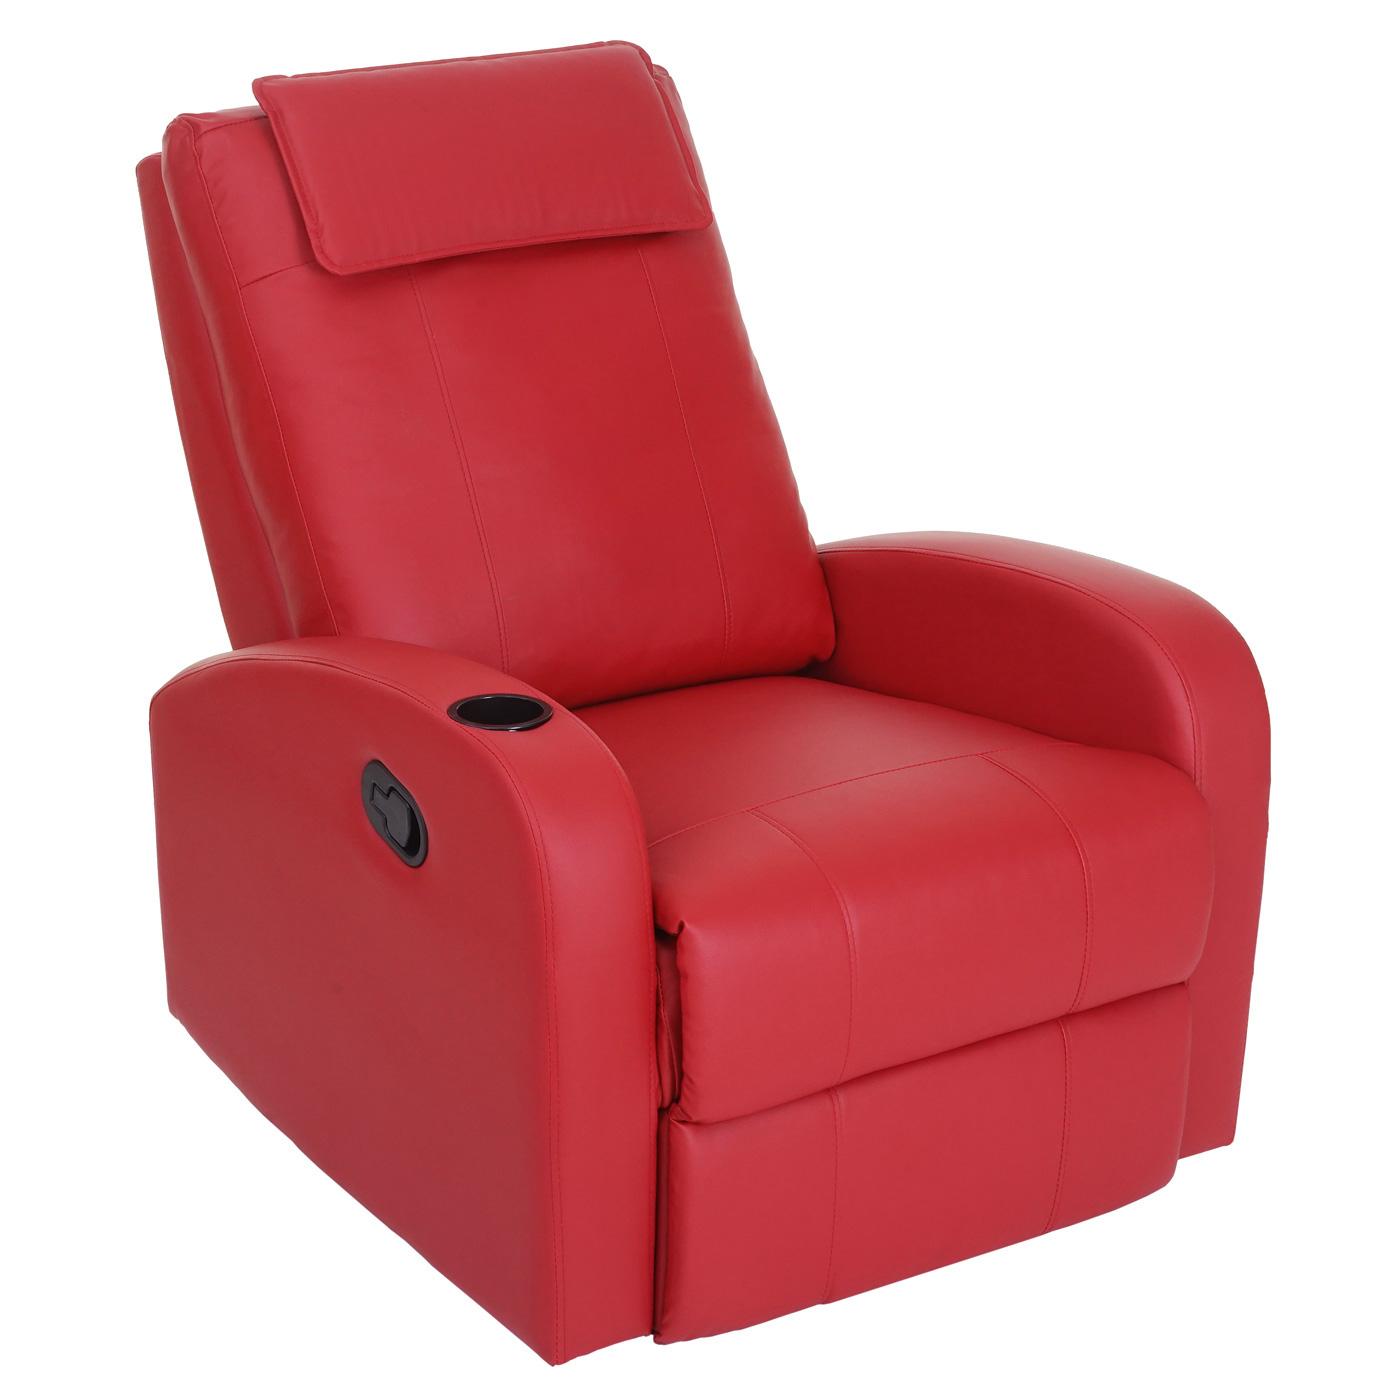 tv sessel rot williamflooring. Black Bedroom Furniture Sets. Home Design Ideas